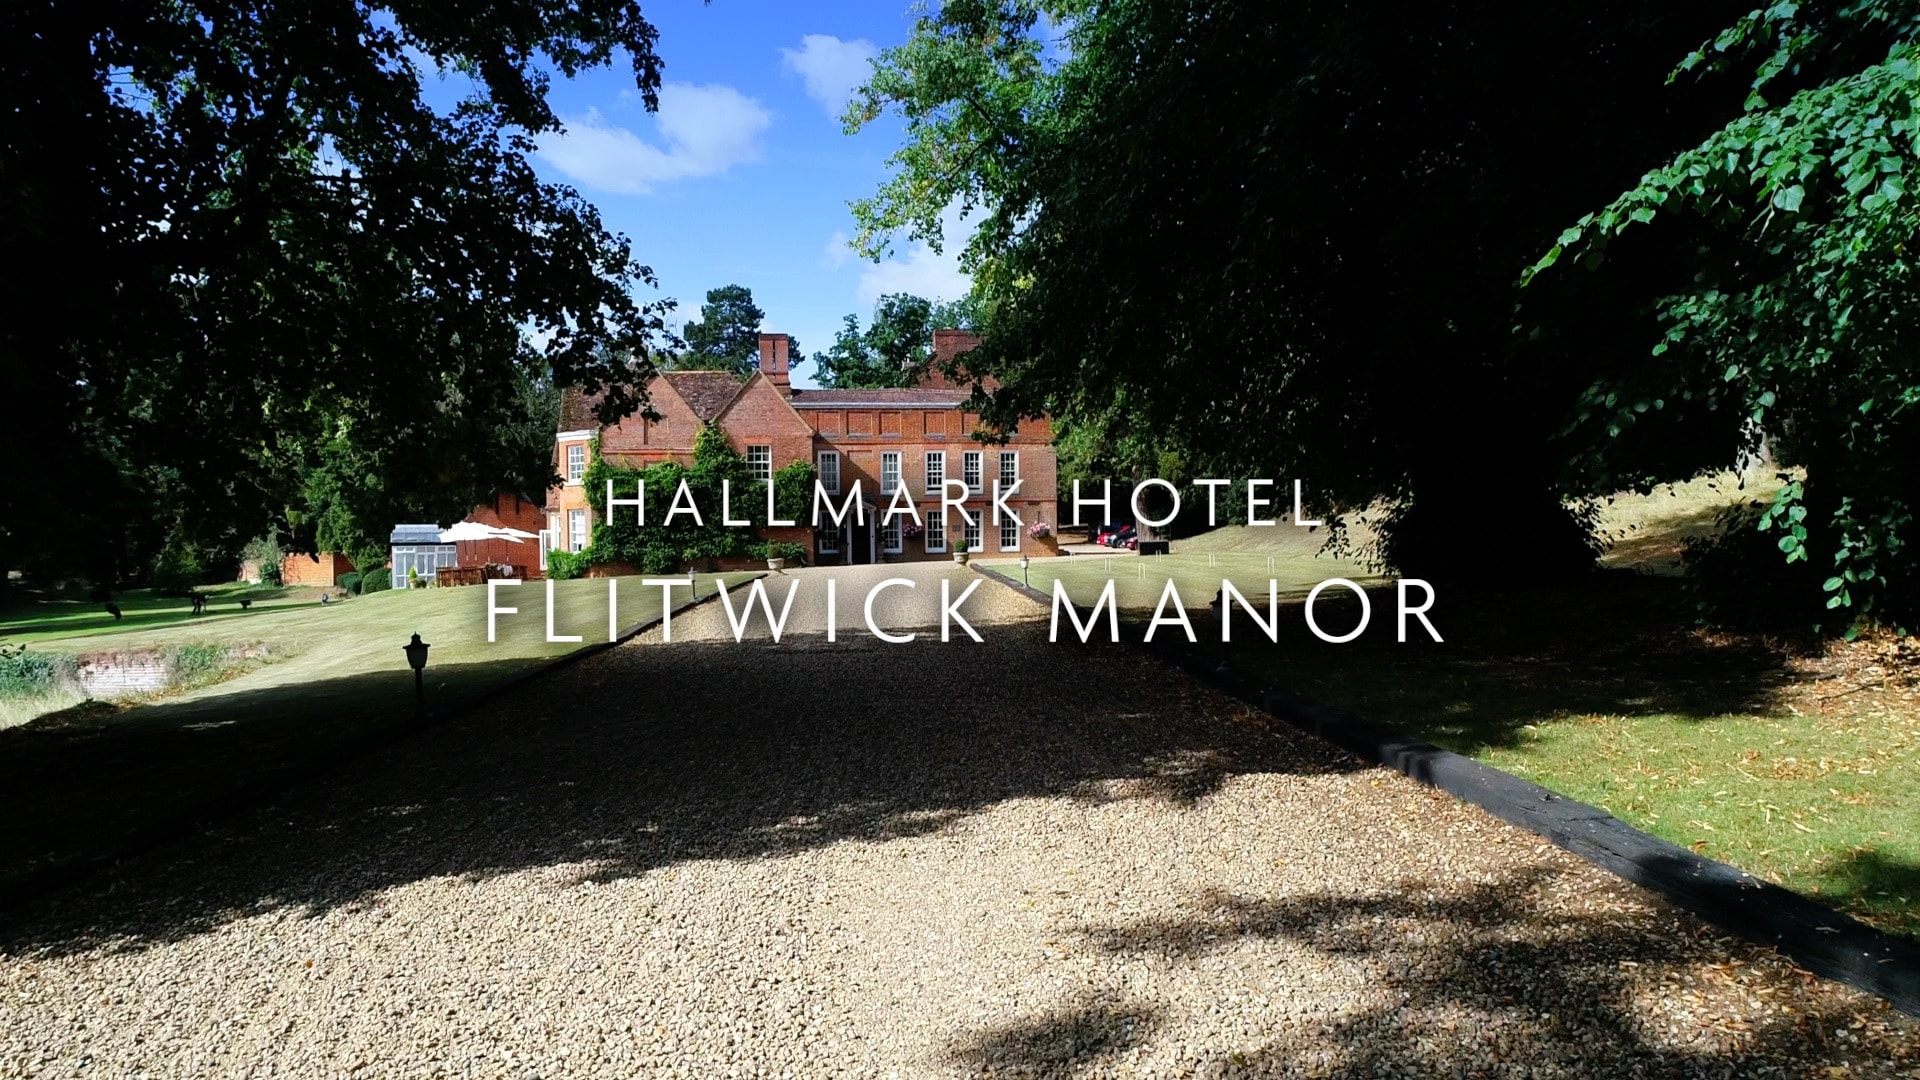 Flitwick Manor Hotel